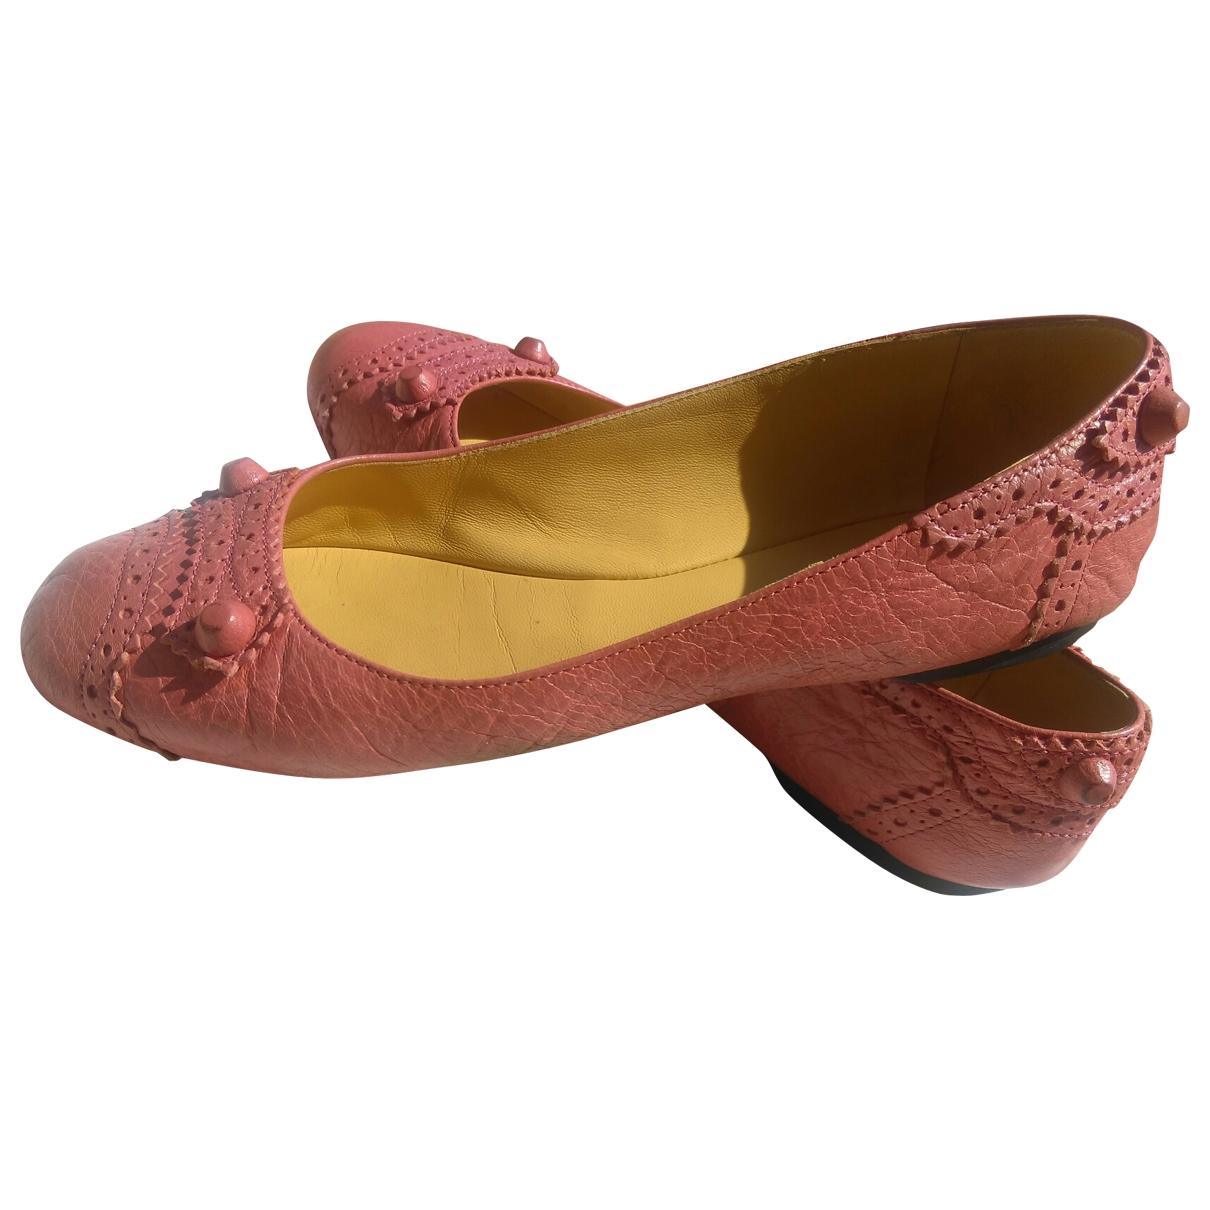 Balenciaga \N Pink Leather Ballet flats for Women 39.5 EU